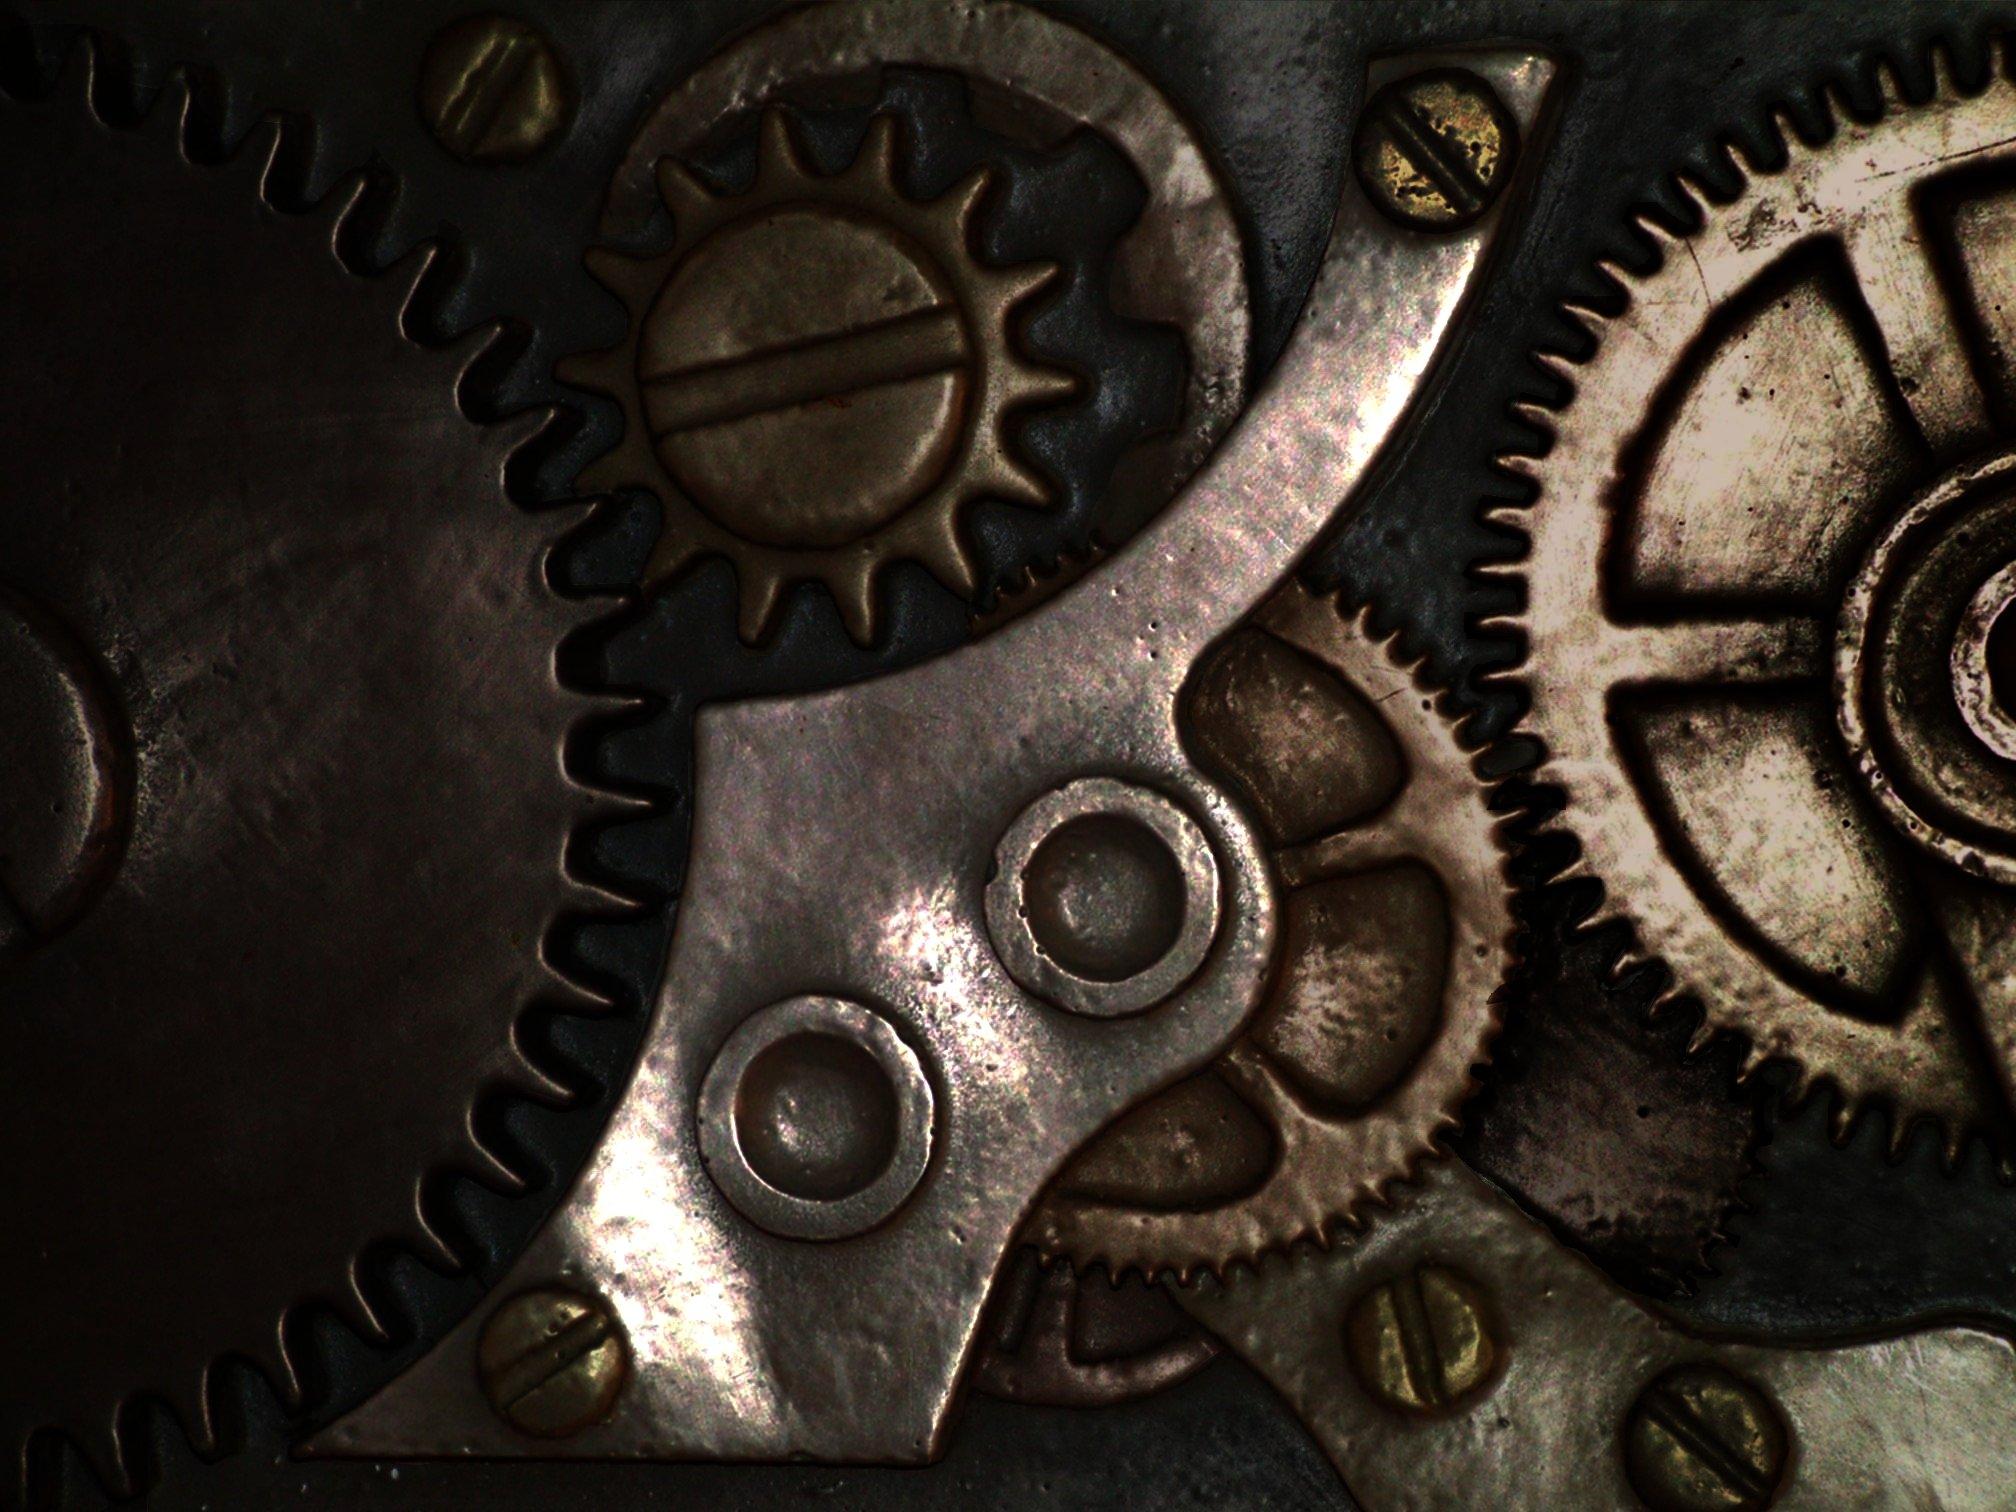 gears wallpaper clocks steampunk - photo #11